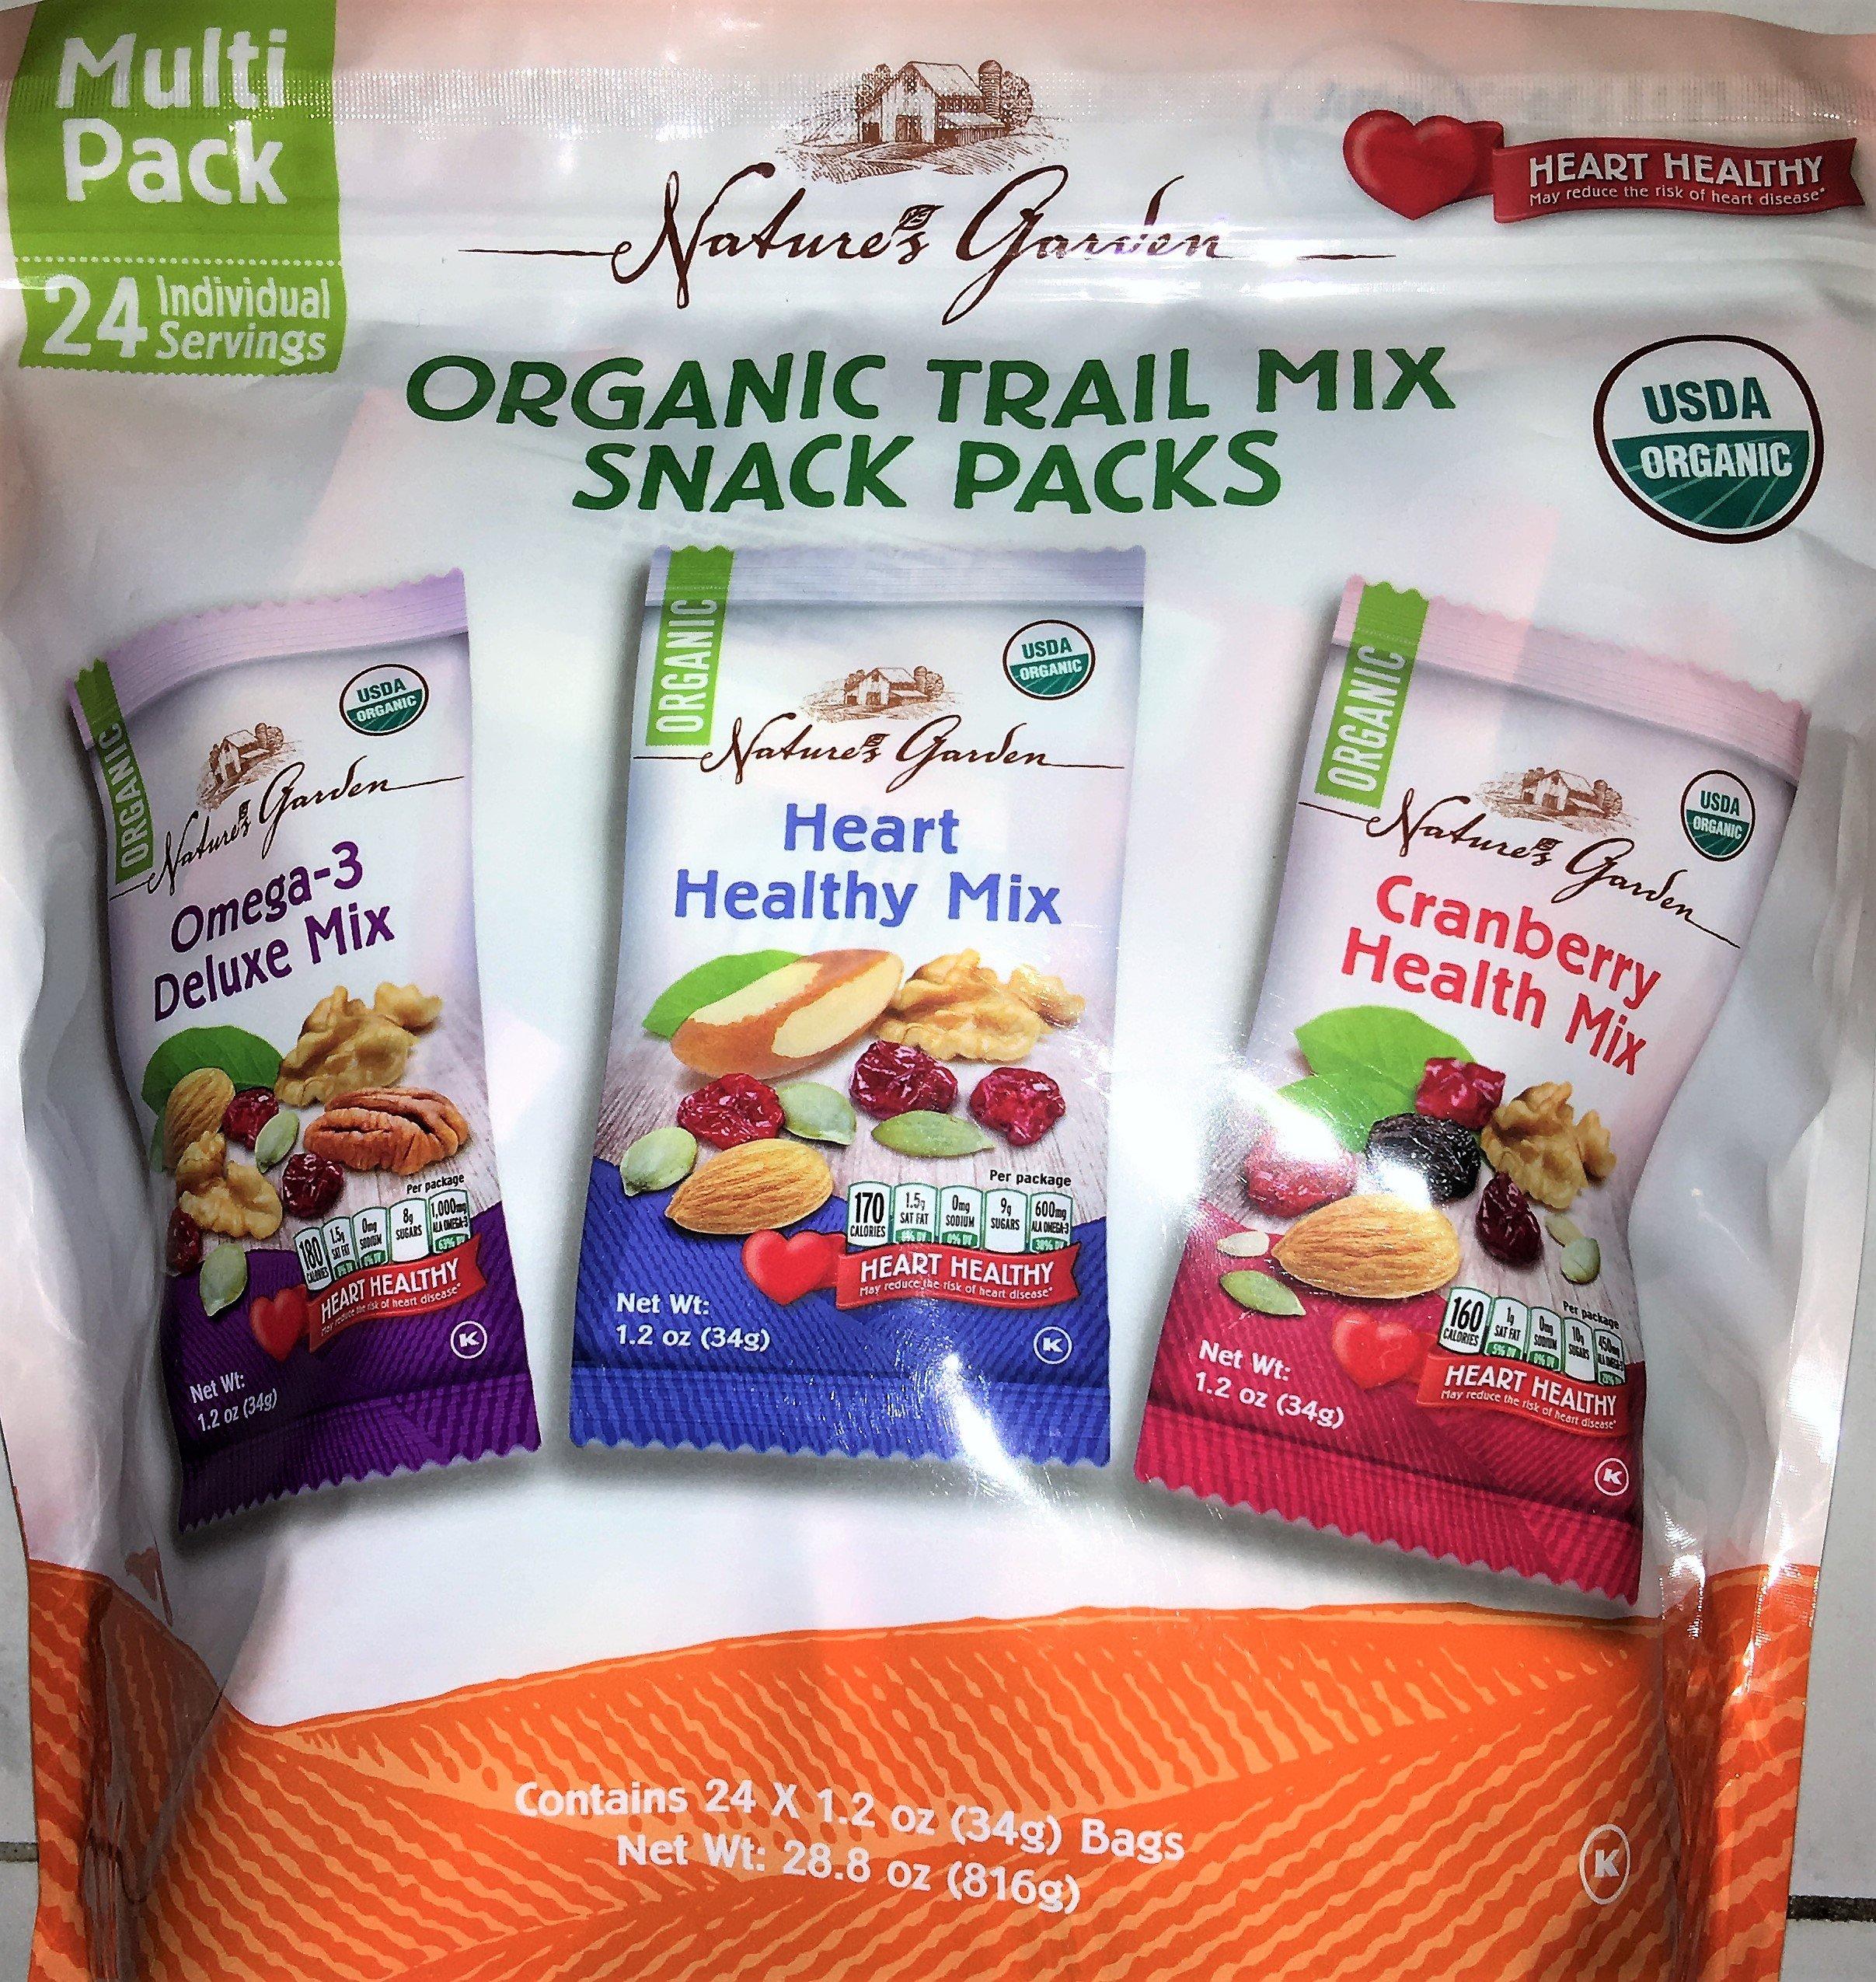 Organic snack packs